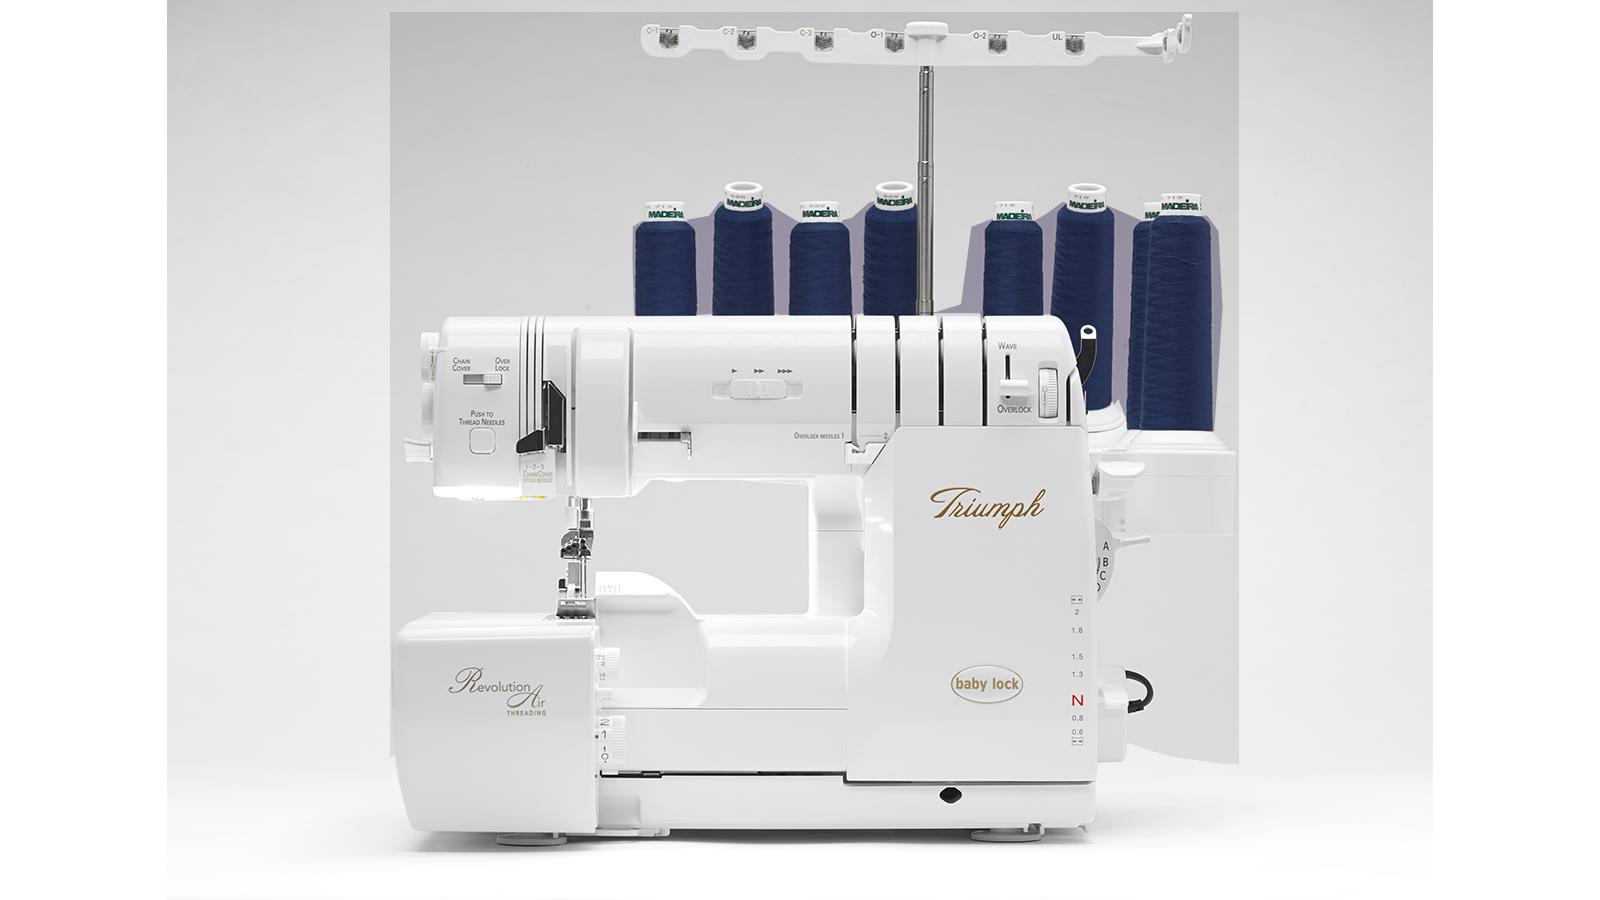 Industrial sewing machines: classes, purpose, maintenance 80